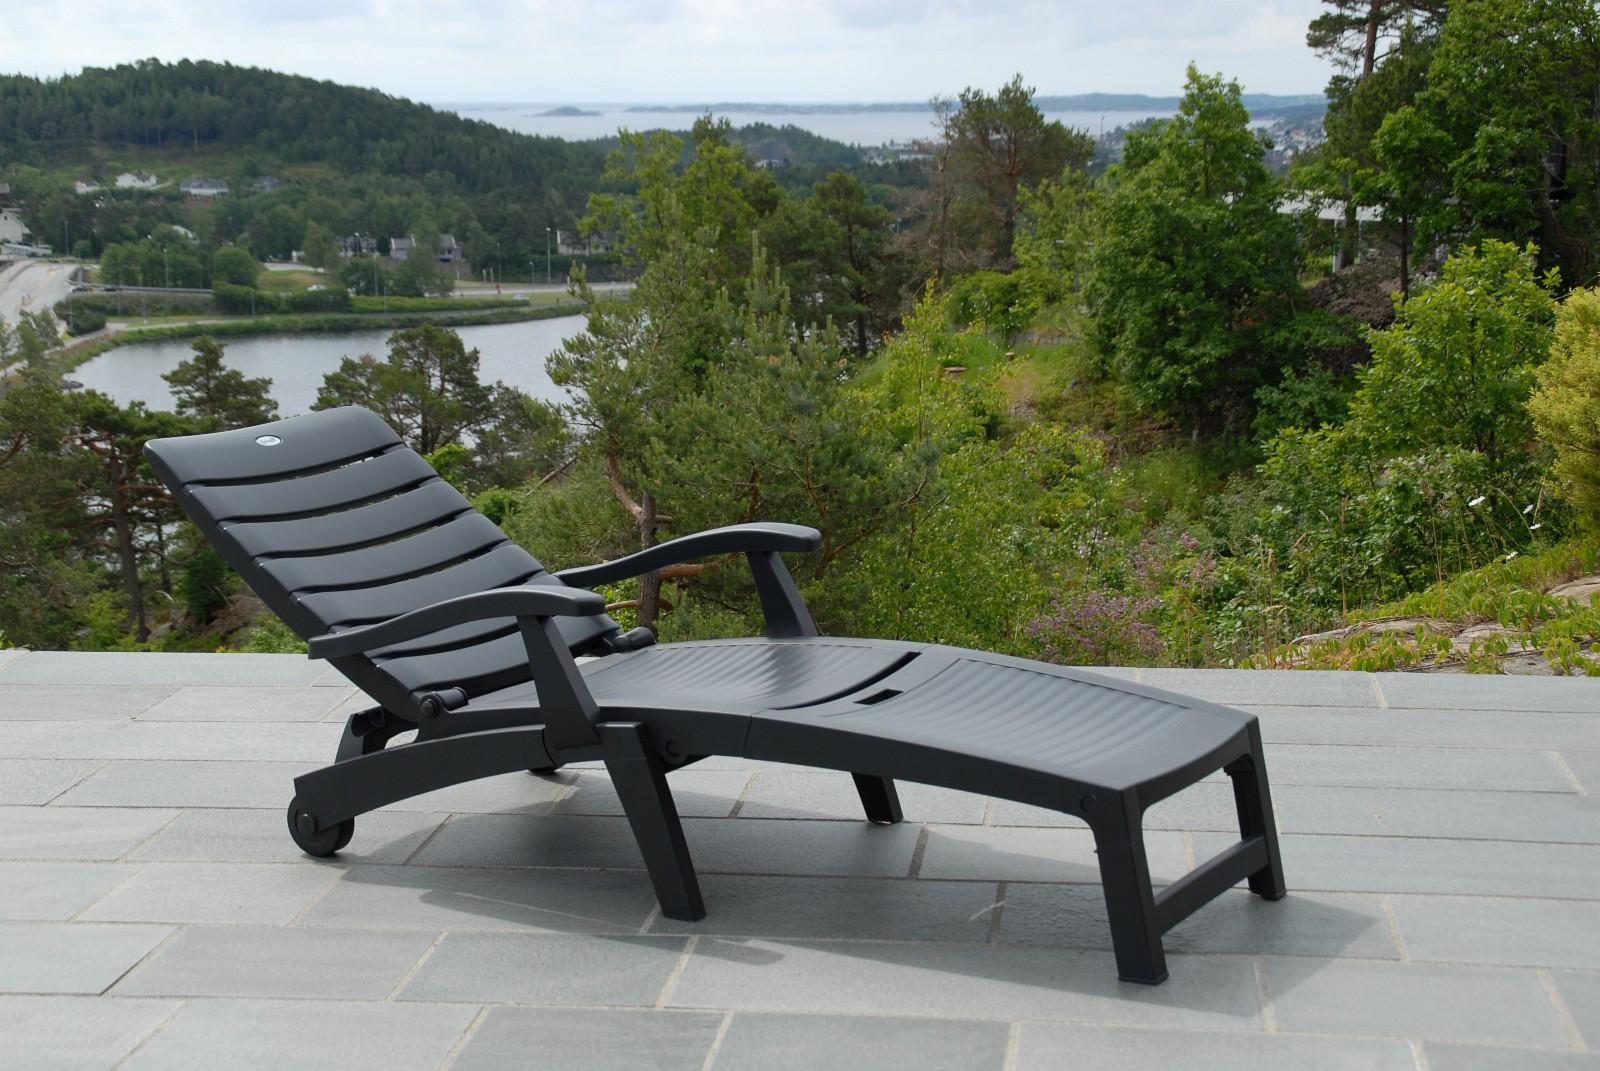 Fabriksnye Hartman plastmøbler Palmyra solseng - antrasittgrå | FINN.no XY-45